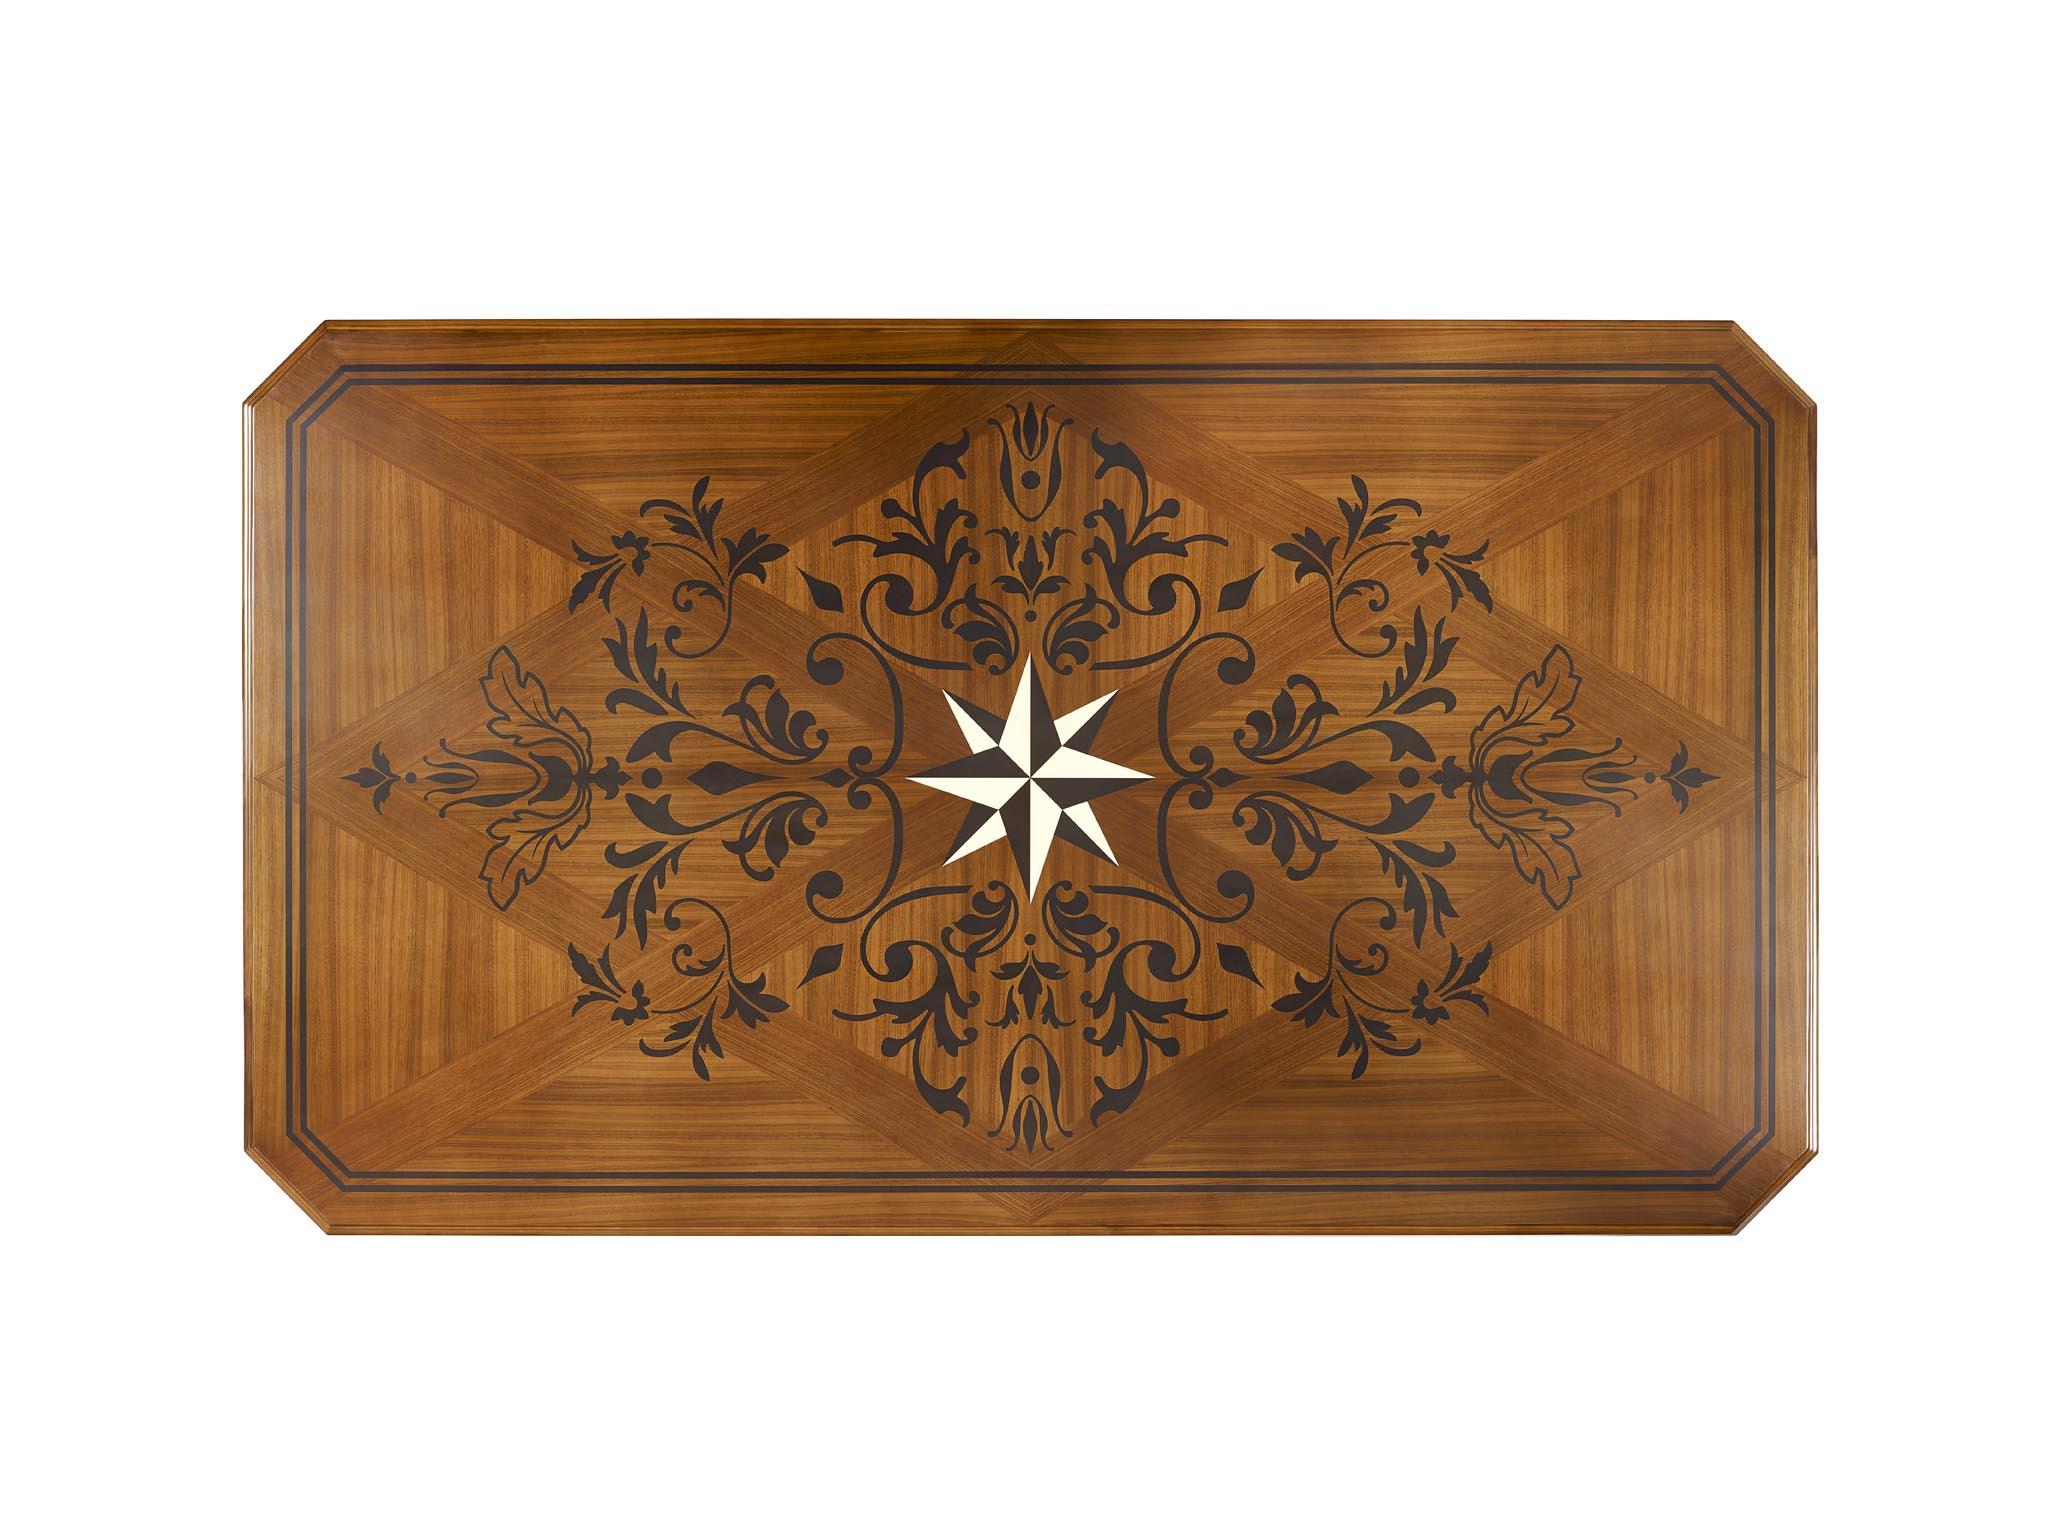 Oficina Inglesa Bespoke Handmade Furniture